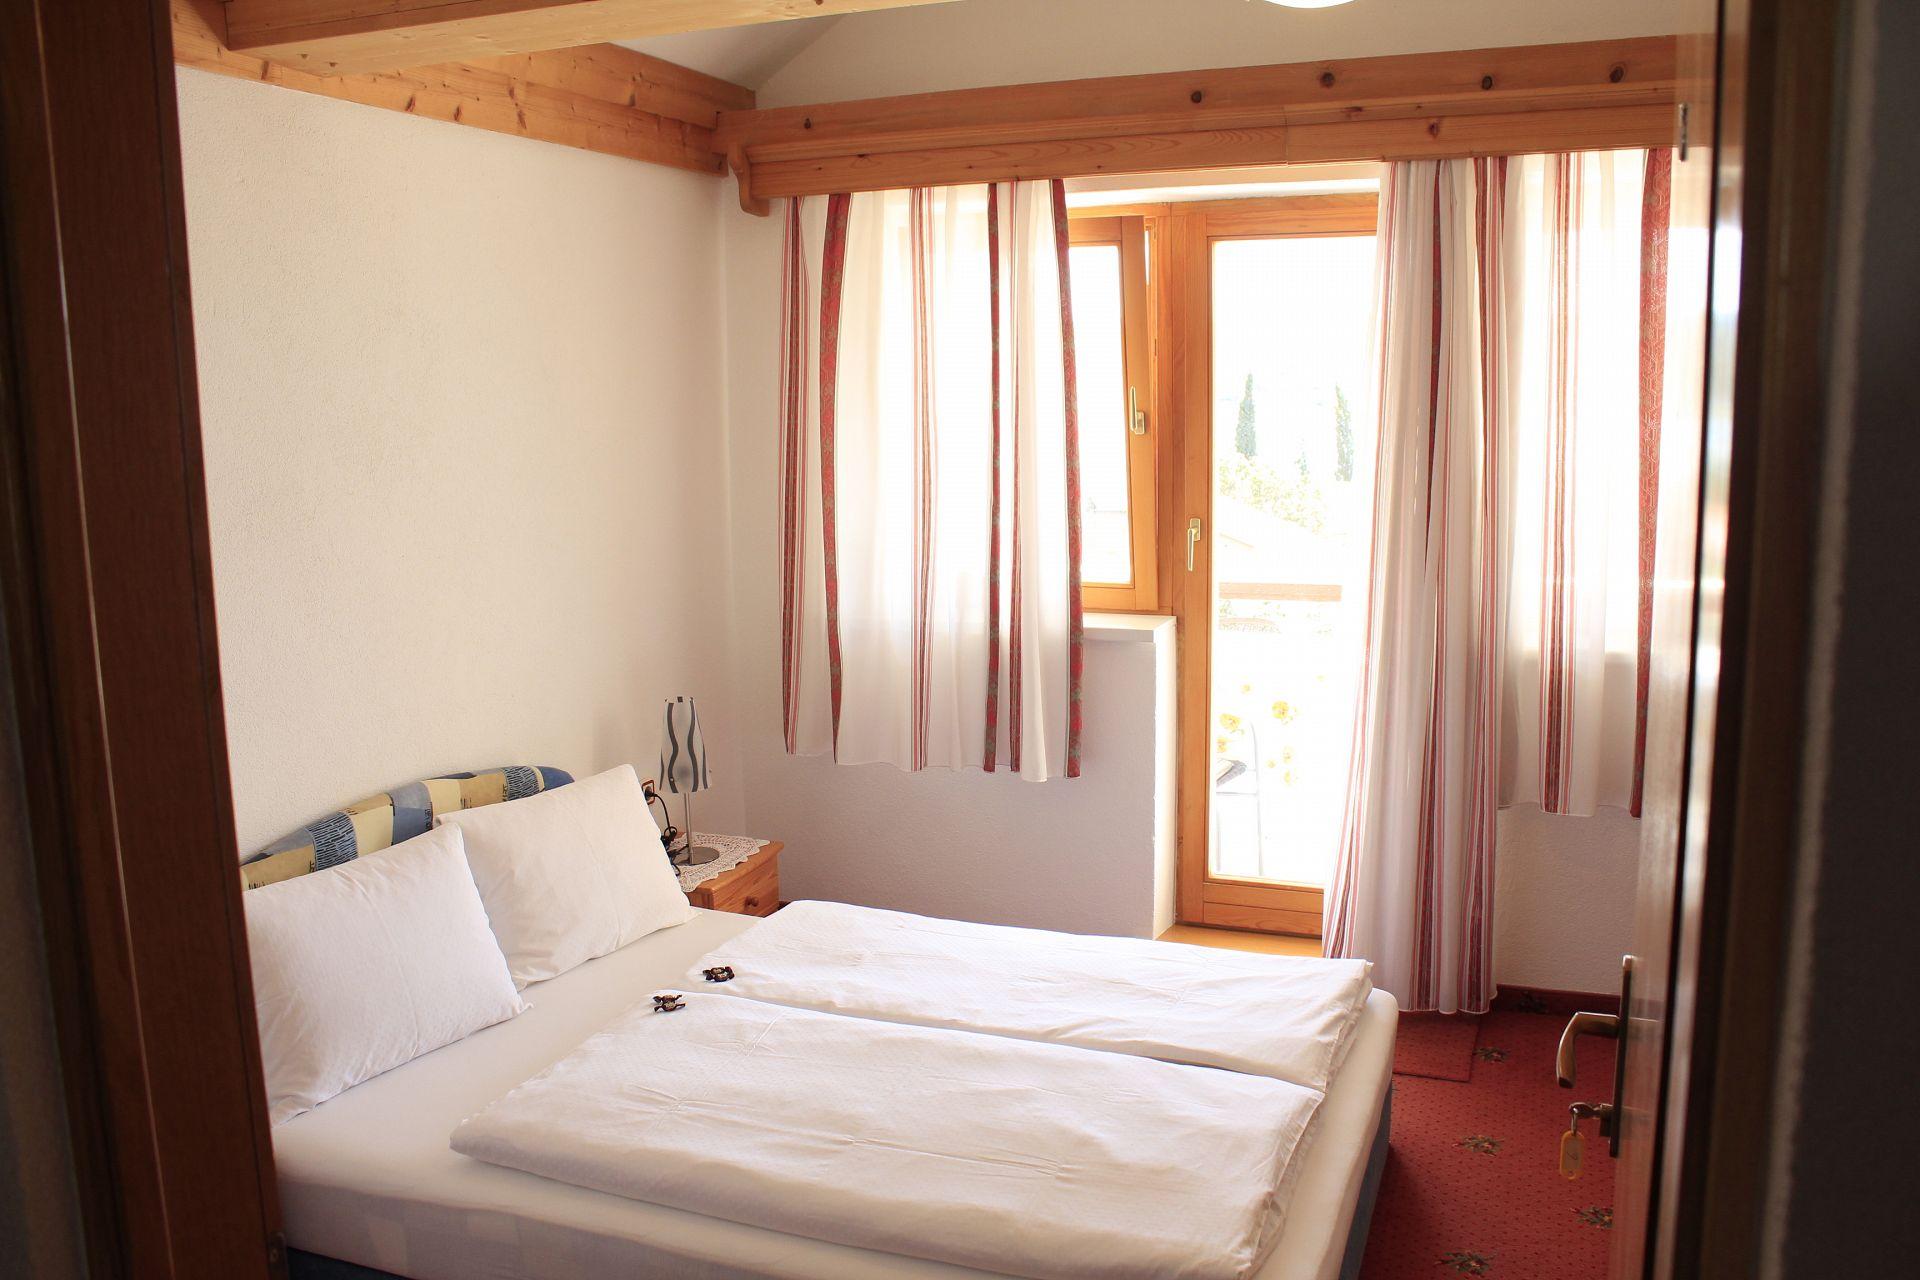 Apartamente Apartment Mato A2 Crna Punta, Zadar riviera 52414, Kruševo, , Rajoni i Splitit/Dalmacisë